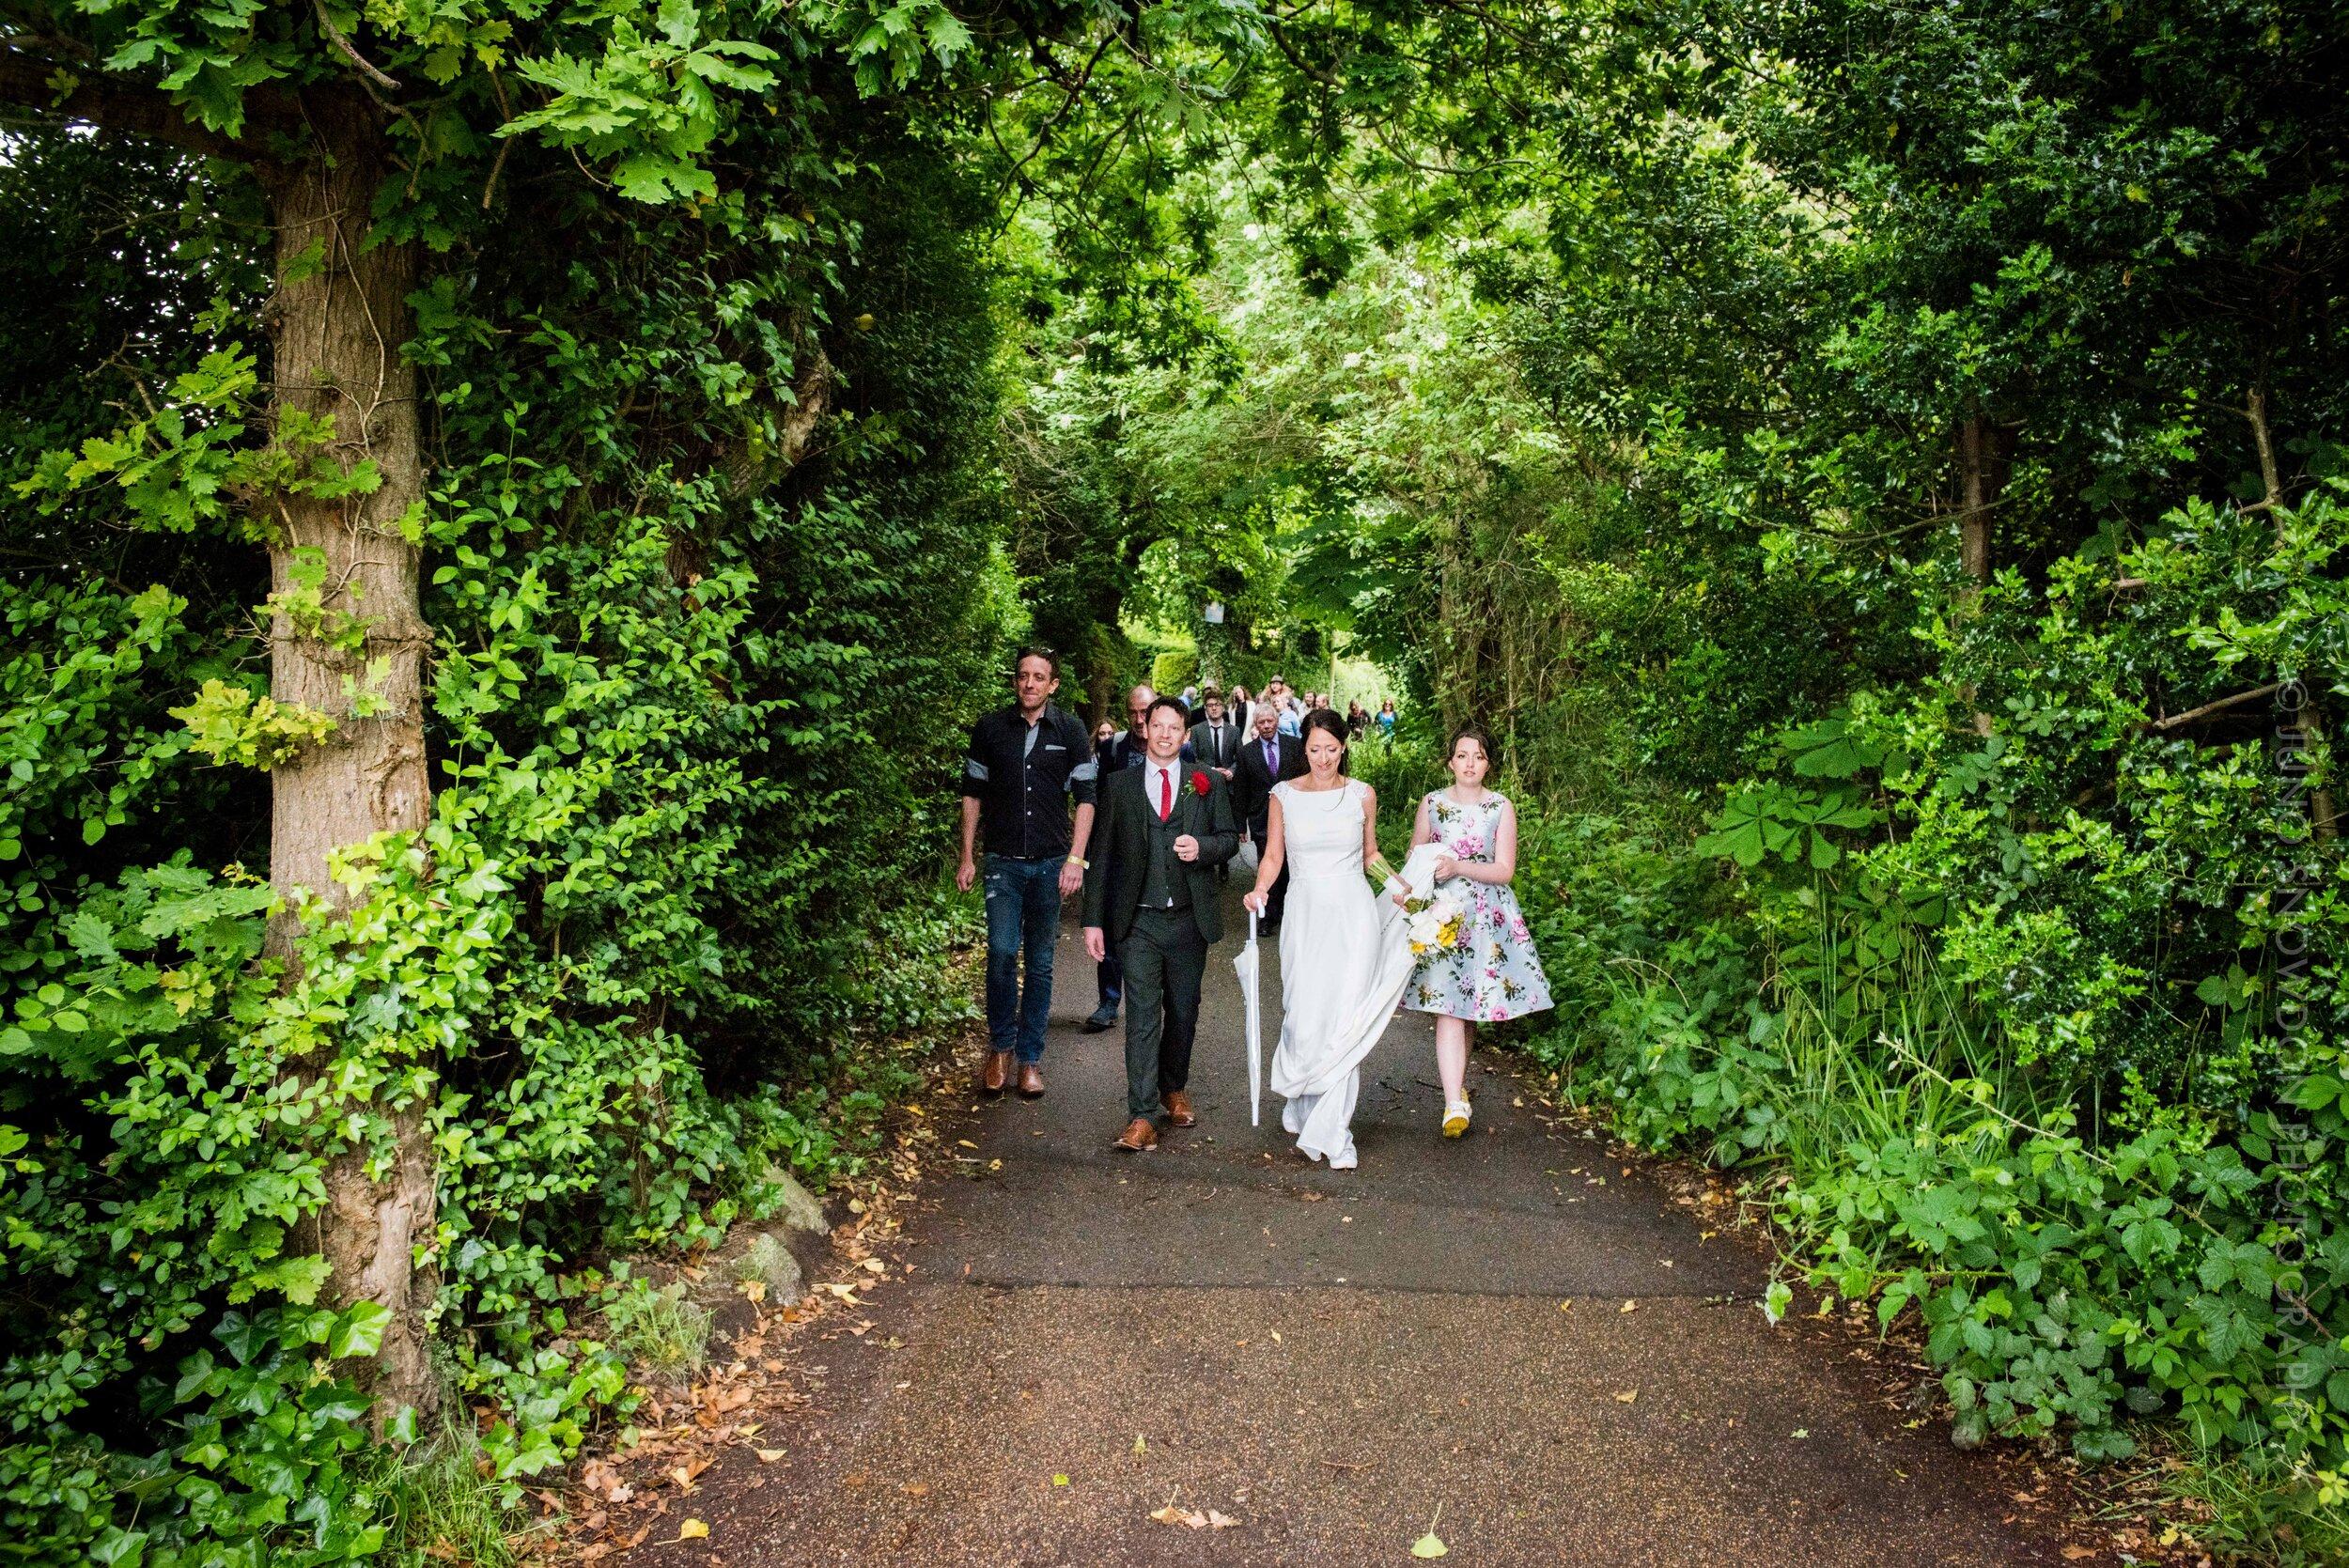 juno-snowdon-photography-wedding-7894.jpg